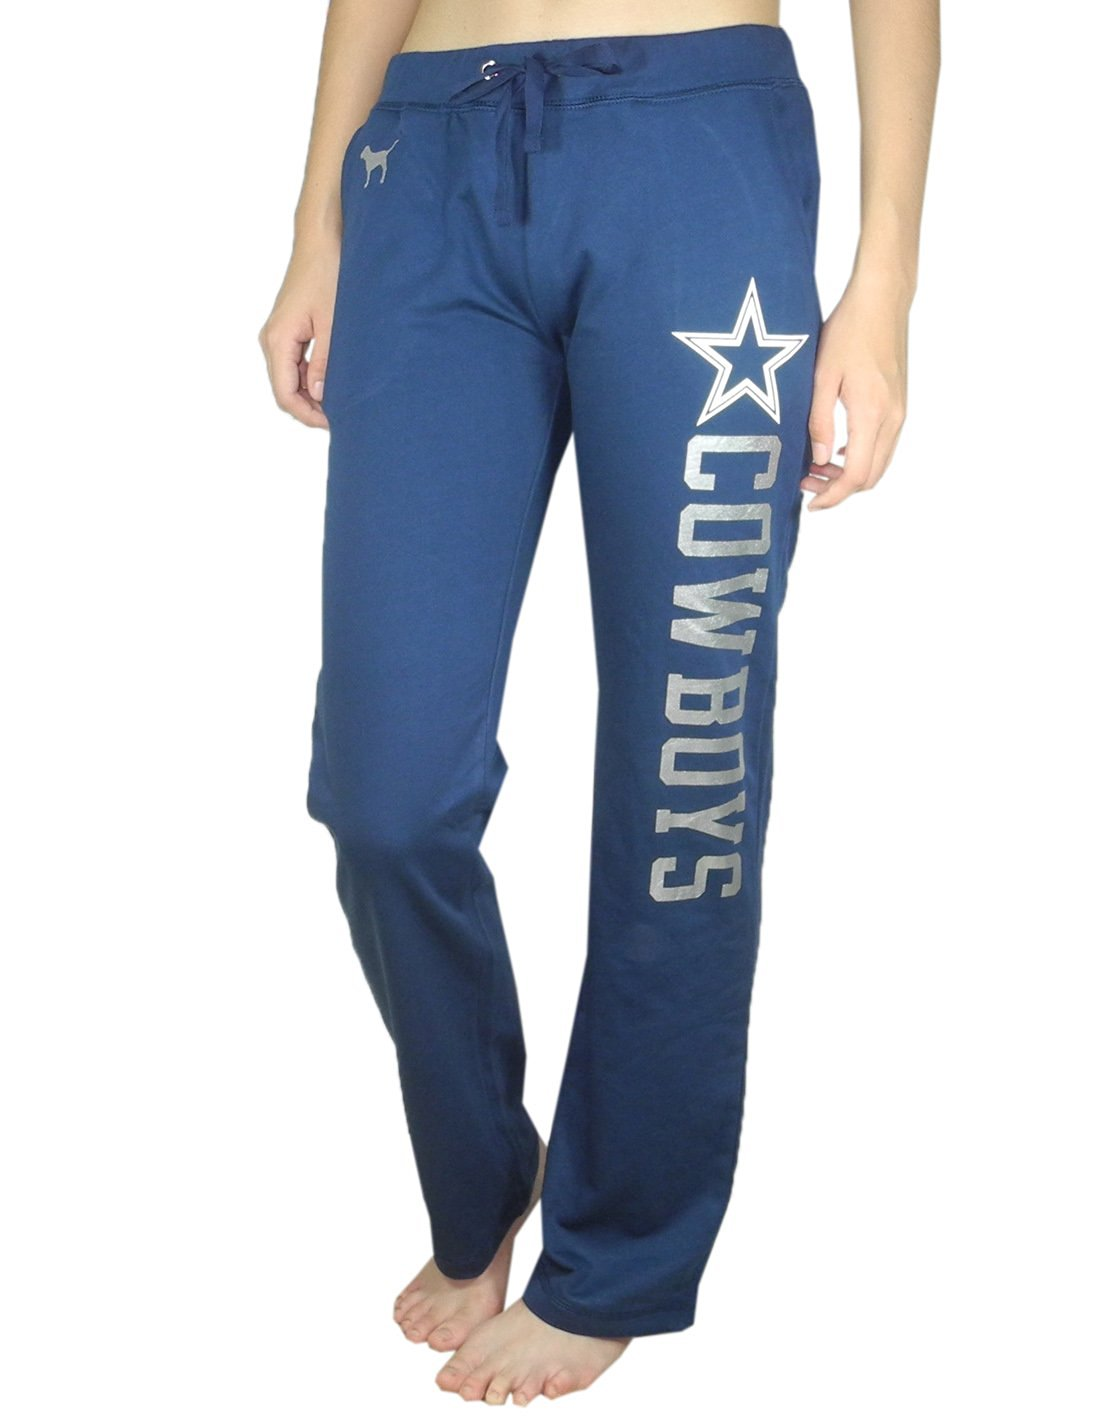 Buy Womens NFL Dallas Cowboys Pajama Pants by Pink Victorias Secret ... b124068ac